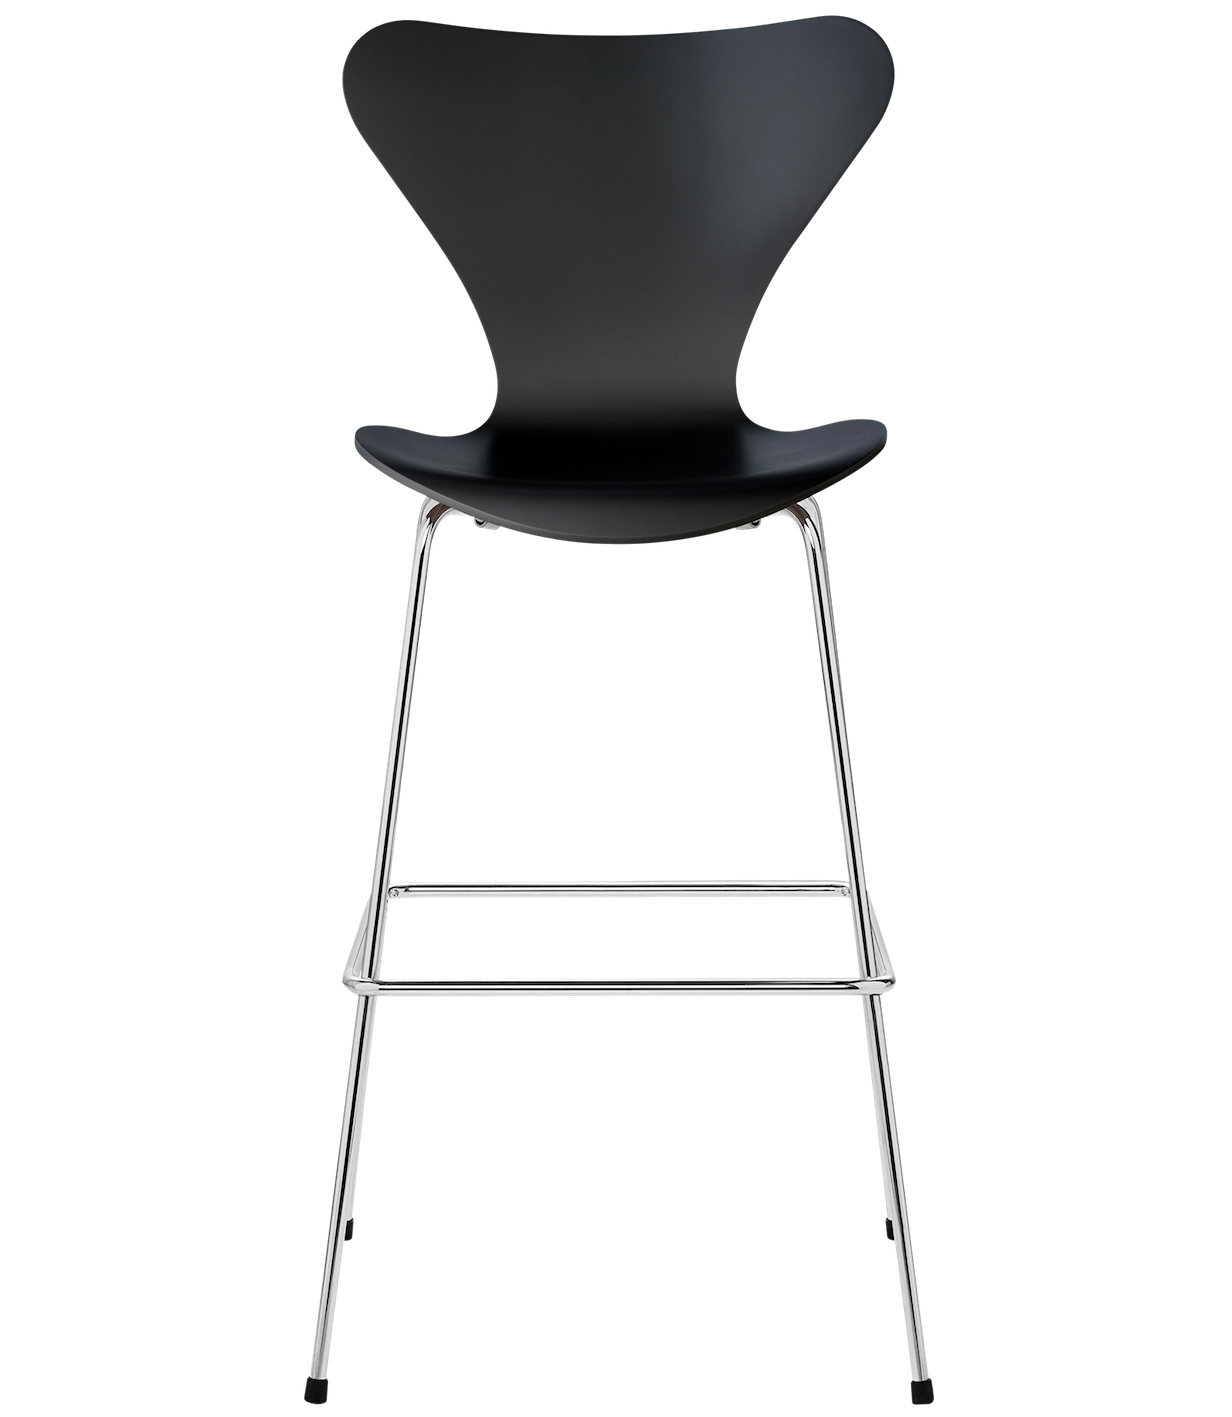 fritz hansen drehstuhl affordable fritz hansen rin drehstuhl schale weiss with fritz hansen. Black Bedroom Furniture Sets. Home Design Ideas